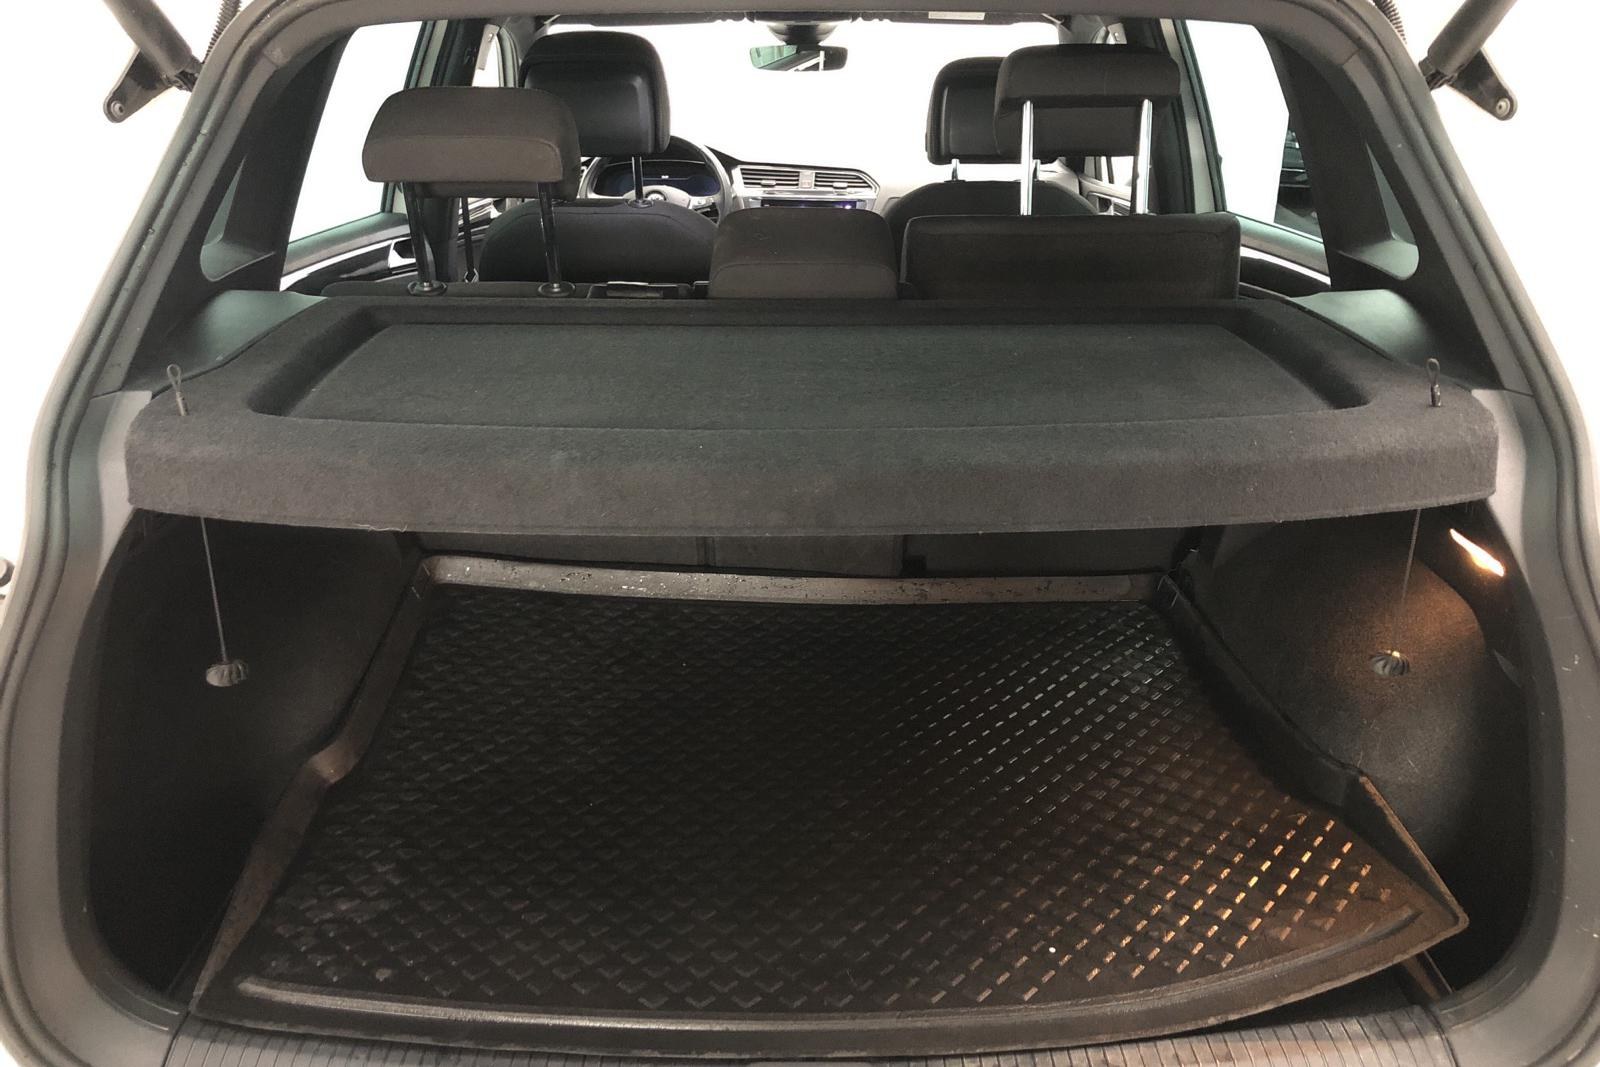 VW Tiguan 2.0 TDI 4MOTION (190hk) - 0 mil - Automat - vit - 2018